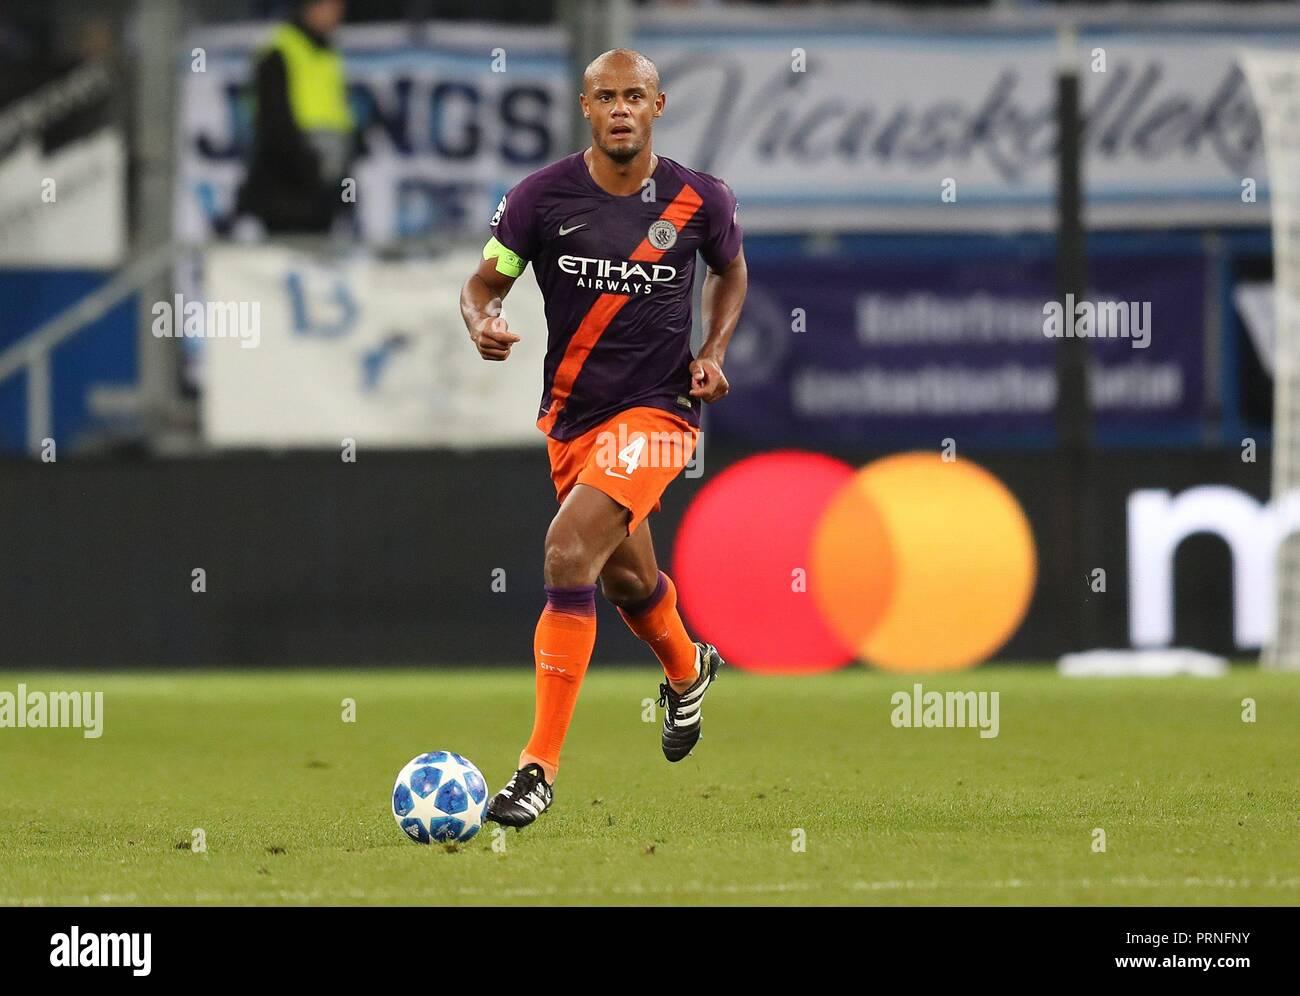 firo: 02.10.2018 Football, Football, Champions League: TSG Hoffenheim - Manchester City 1: 2 Vincent Kompany, single action   usage worldwide - Stock Image